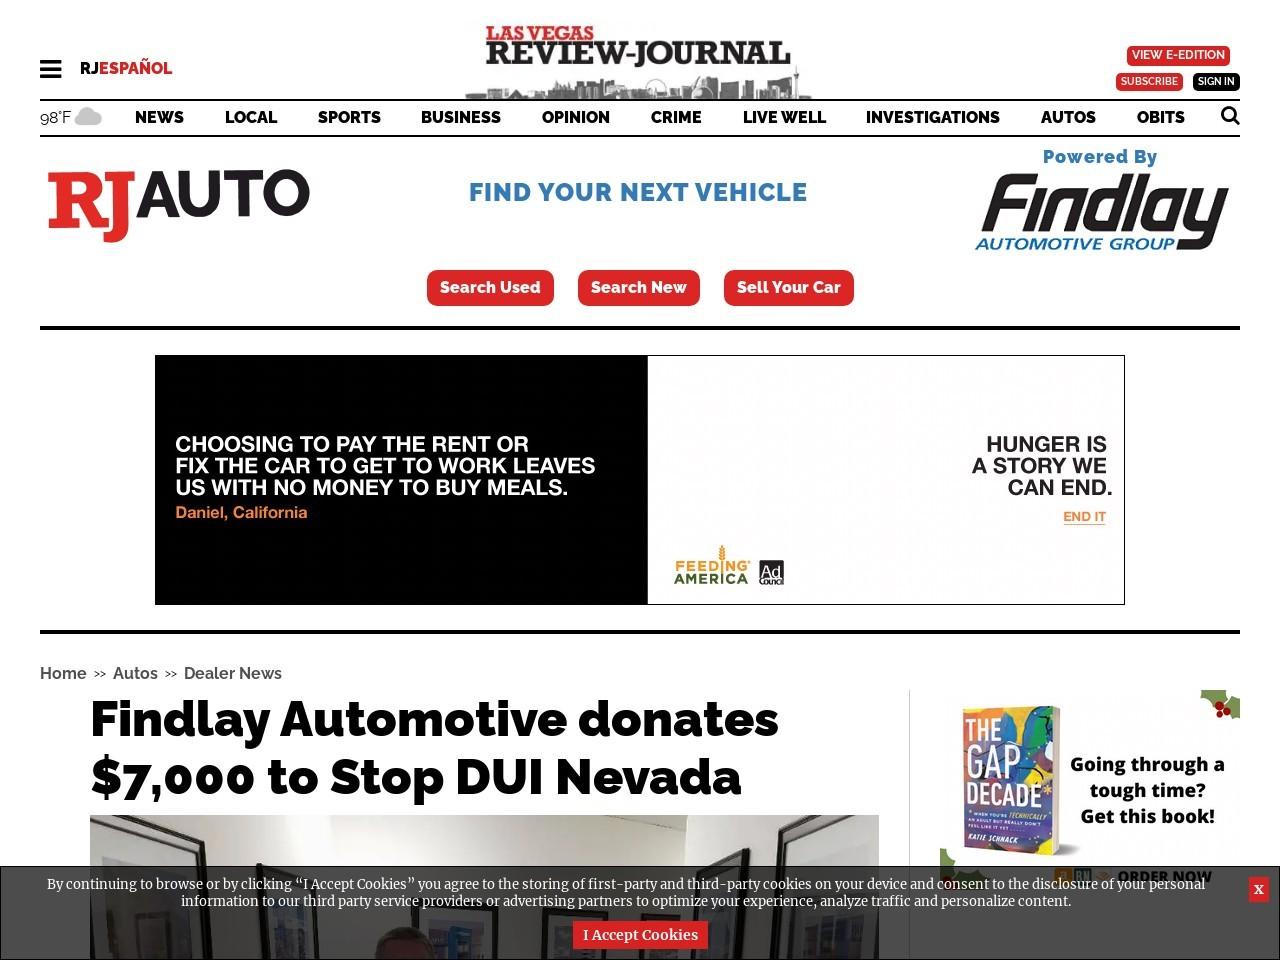 Findlay Automotive donates $7,000 to Stop DUI Nevada